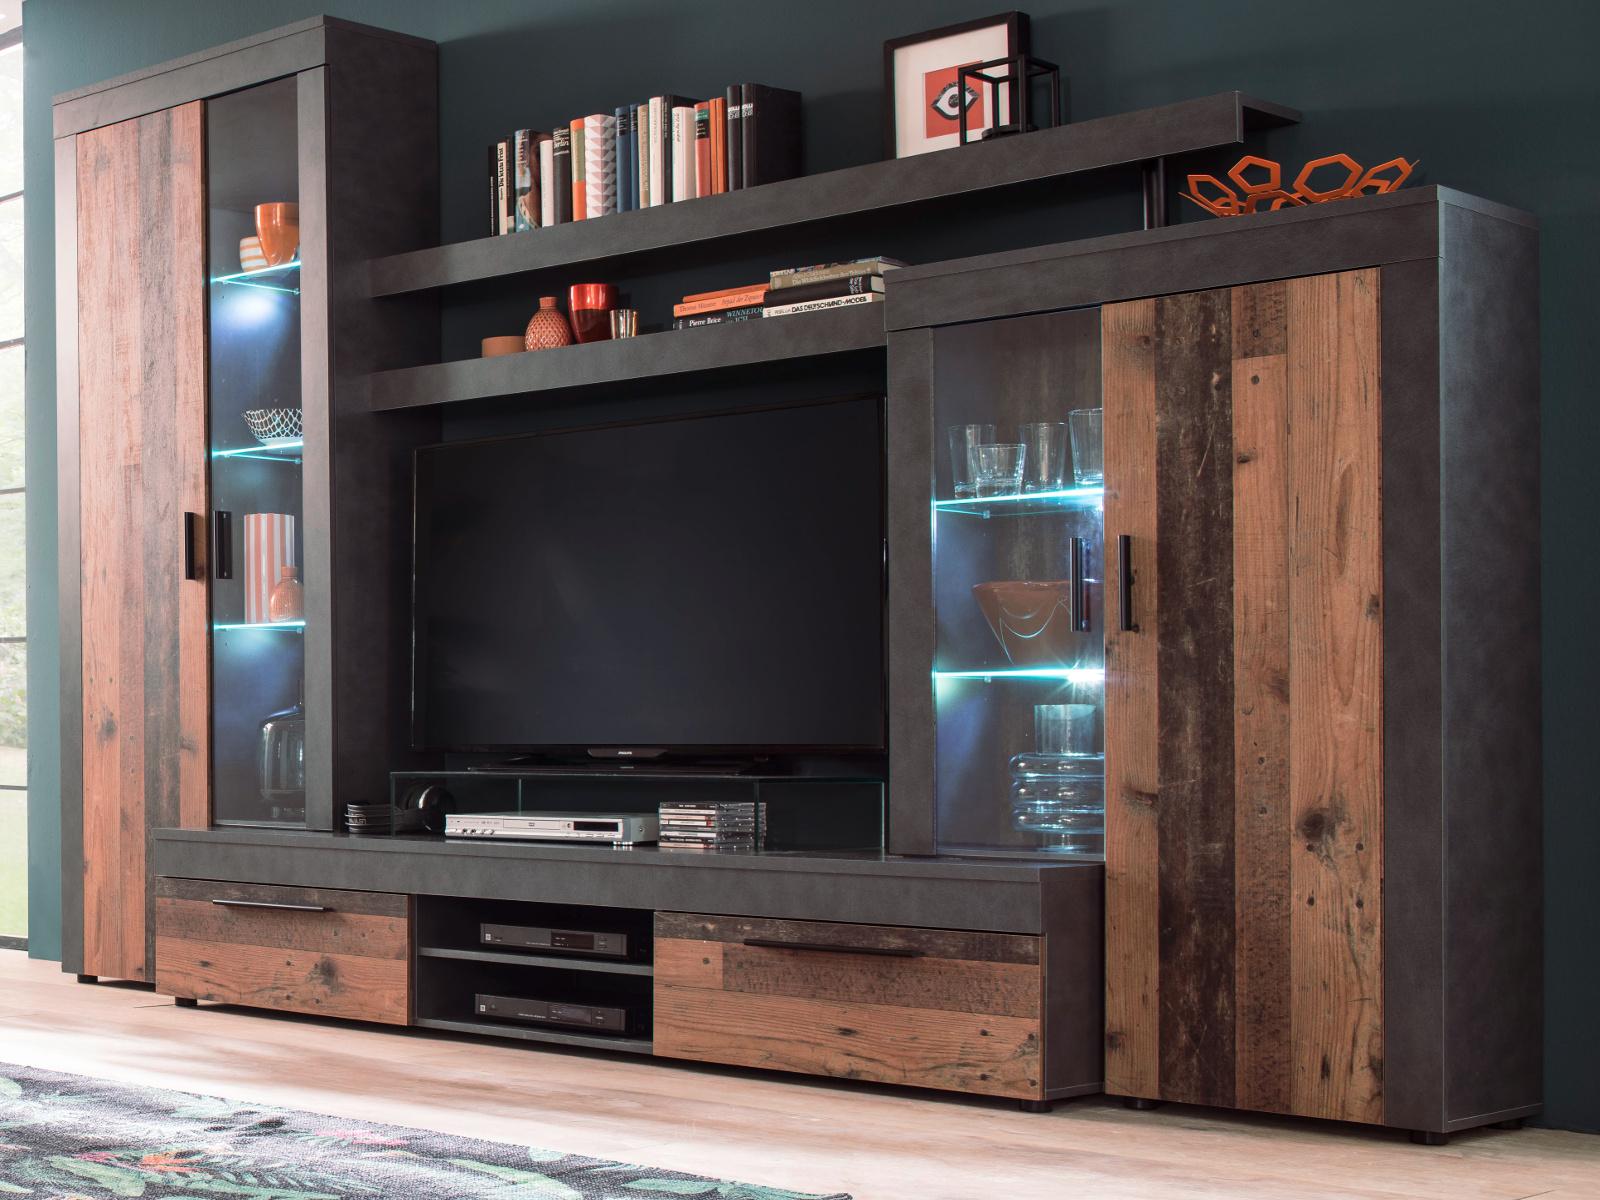 Wohnwand Boom In Used Wood Shabby Design Mit Matera Grau Schrankwand 308 X 212 Cm Inkl Led Beleuchtung